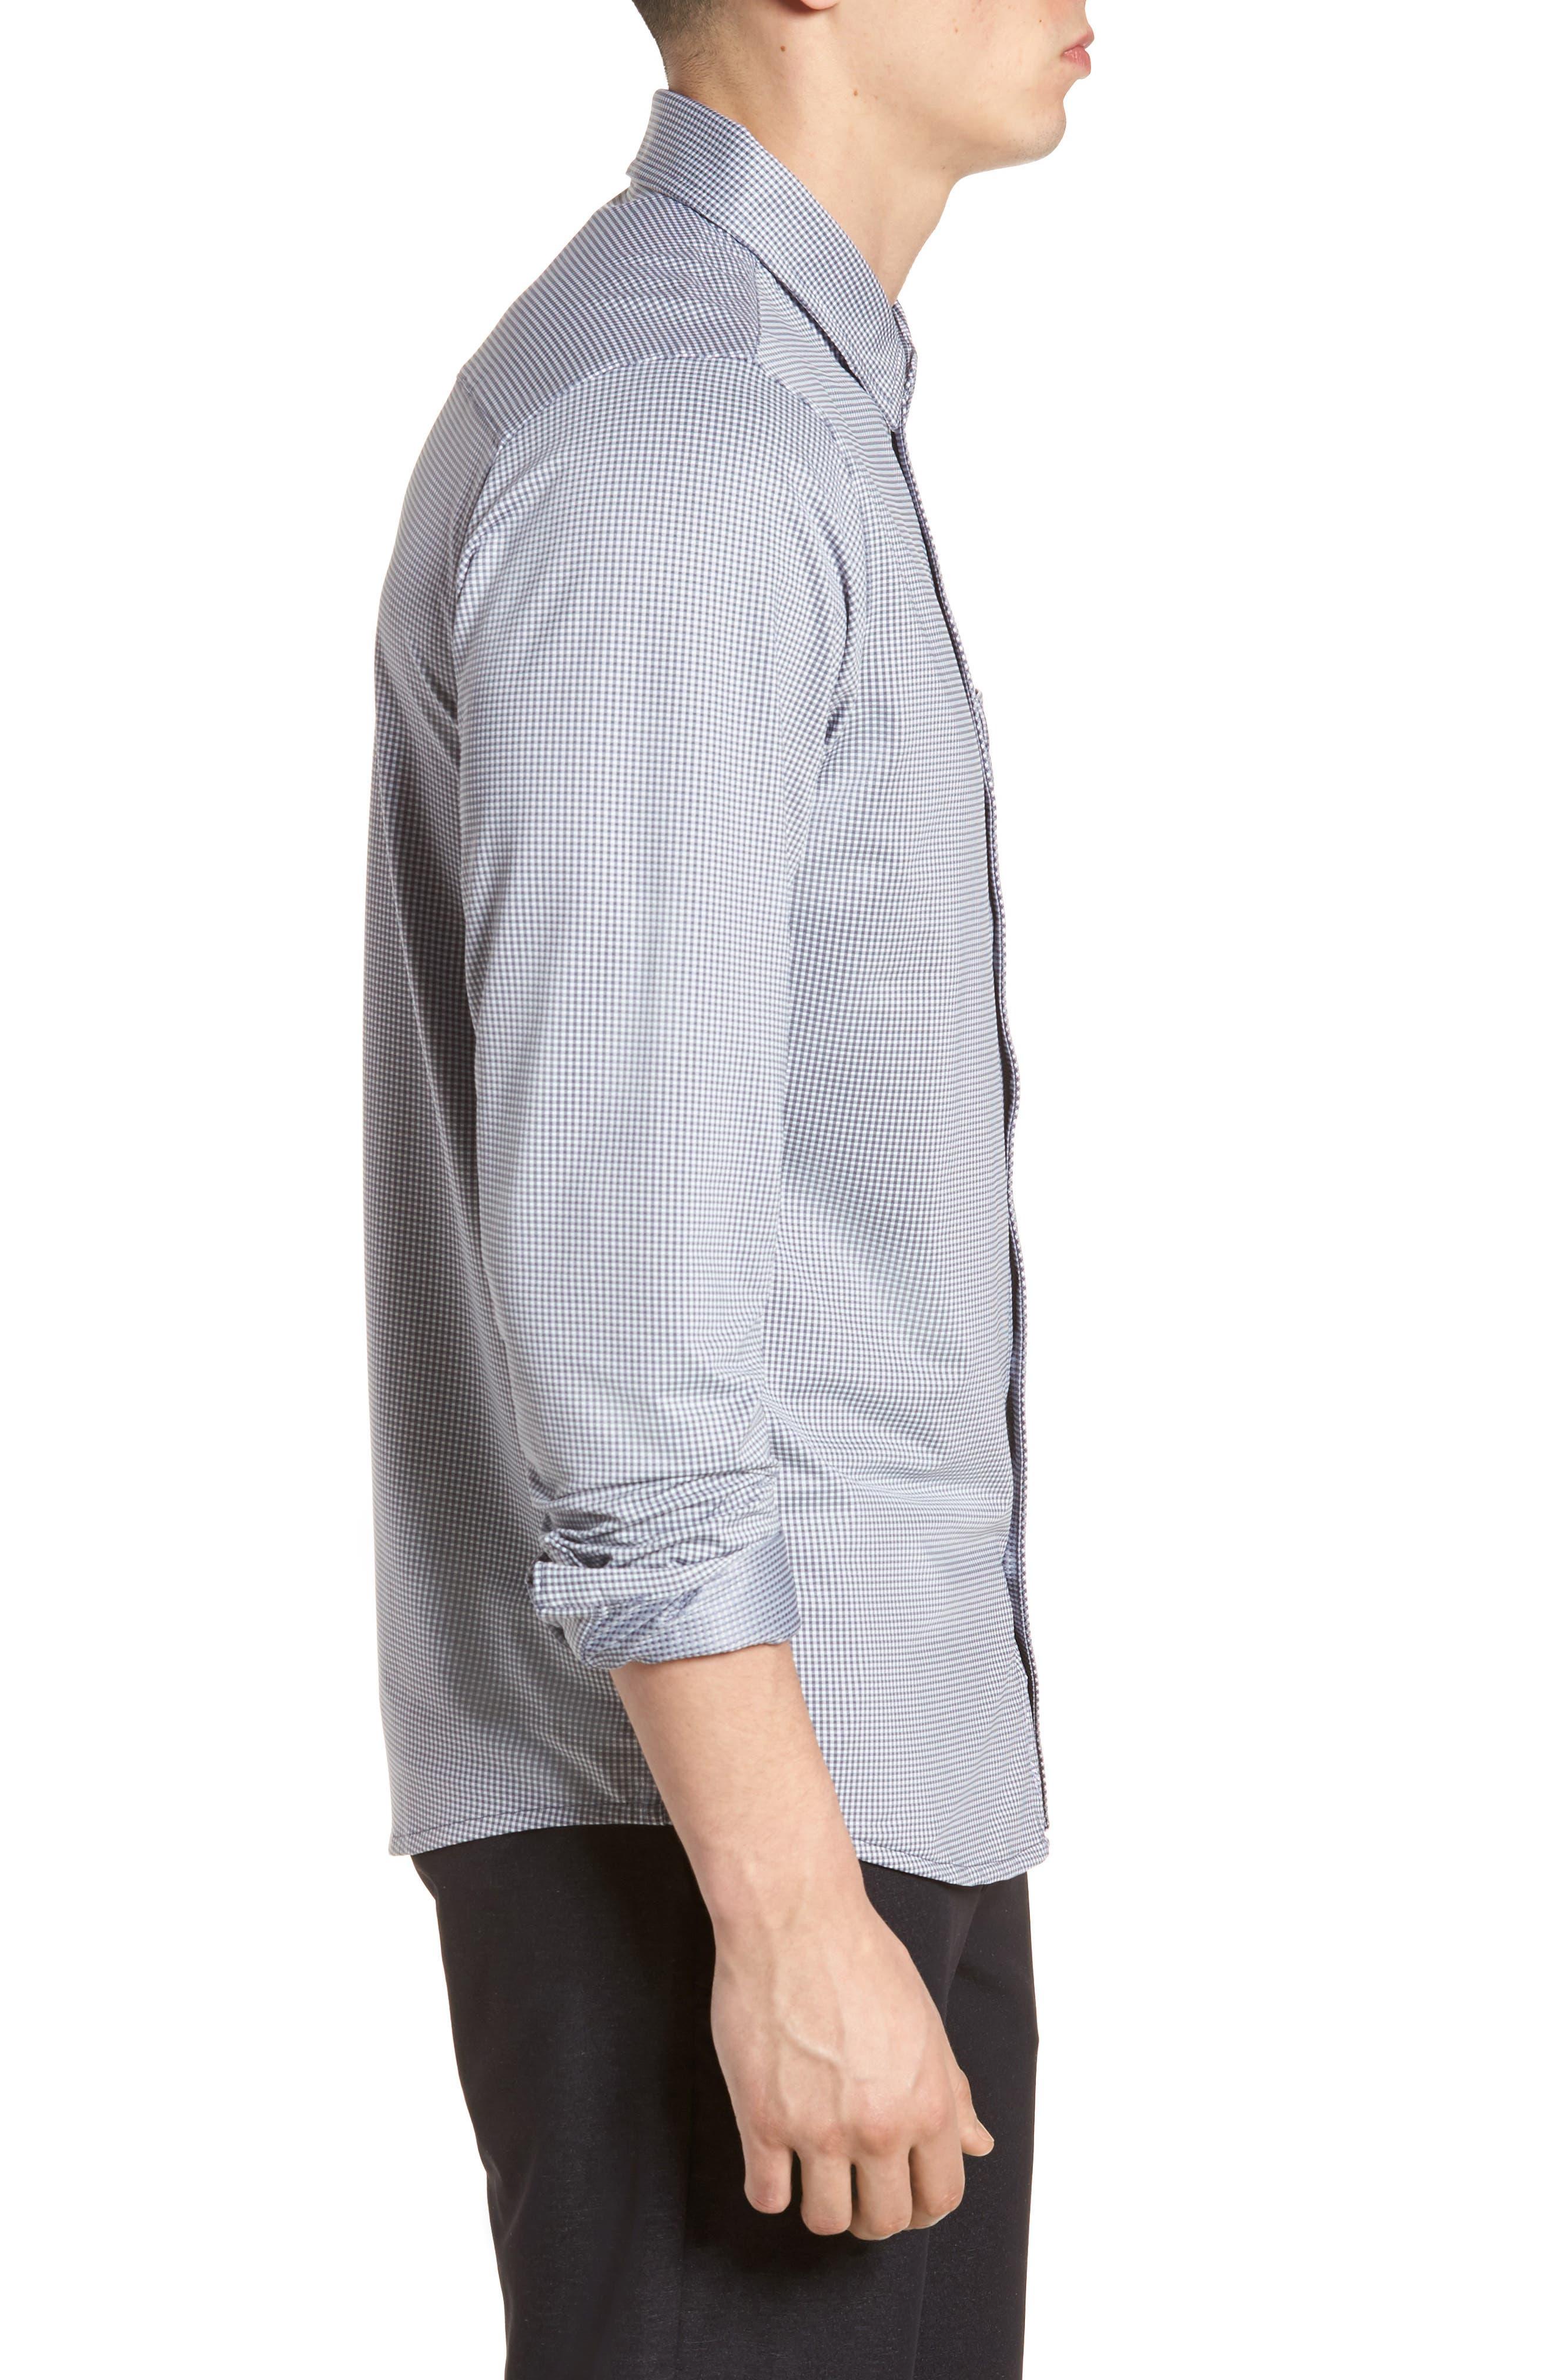 TRAVIS MATHEW,                             Couig Gingham Sport Shirt,                             Alternate thumbnail 3, color,                             105